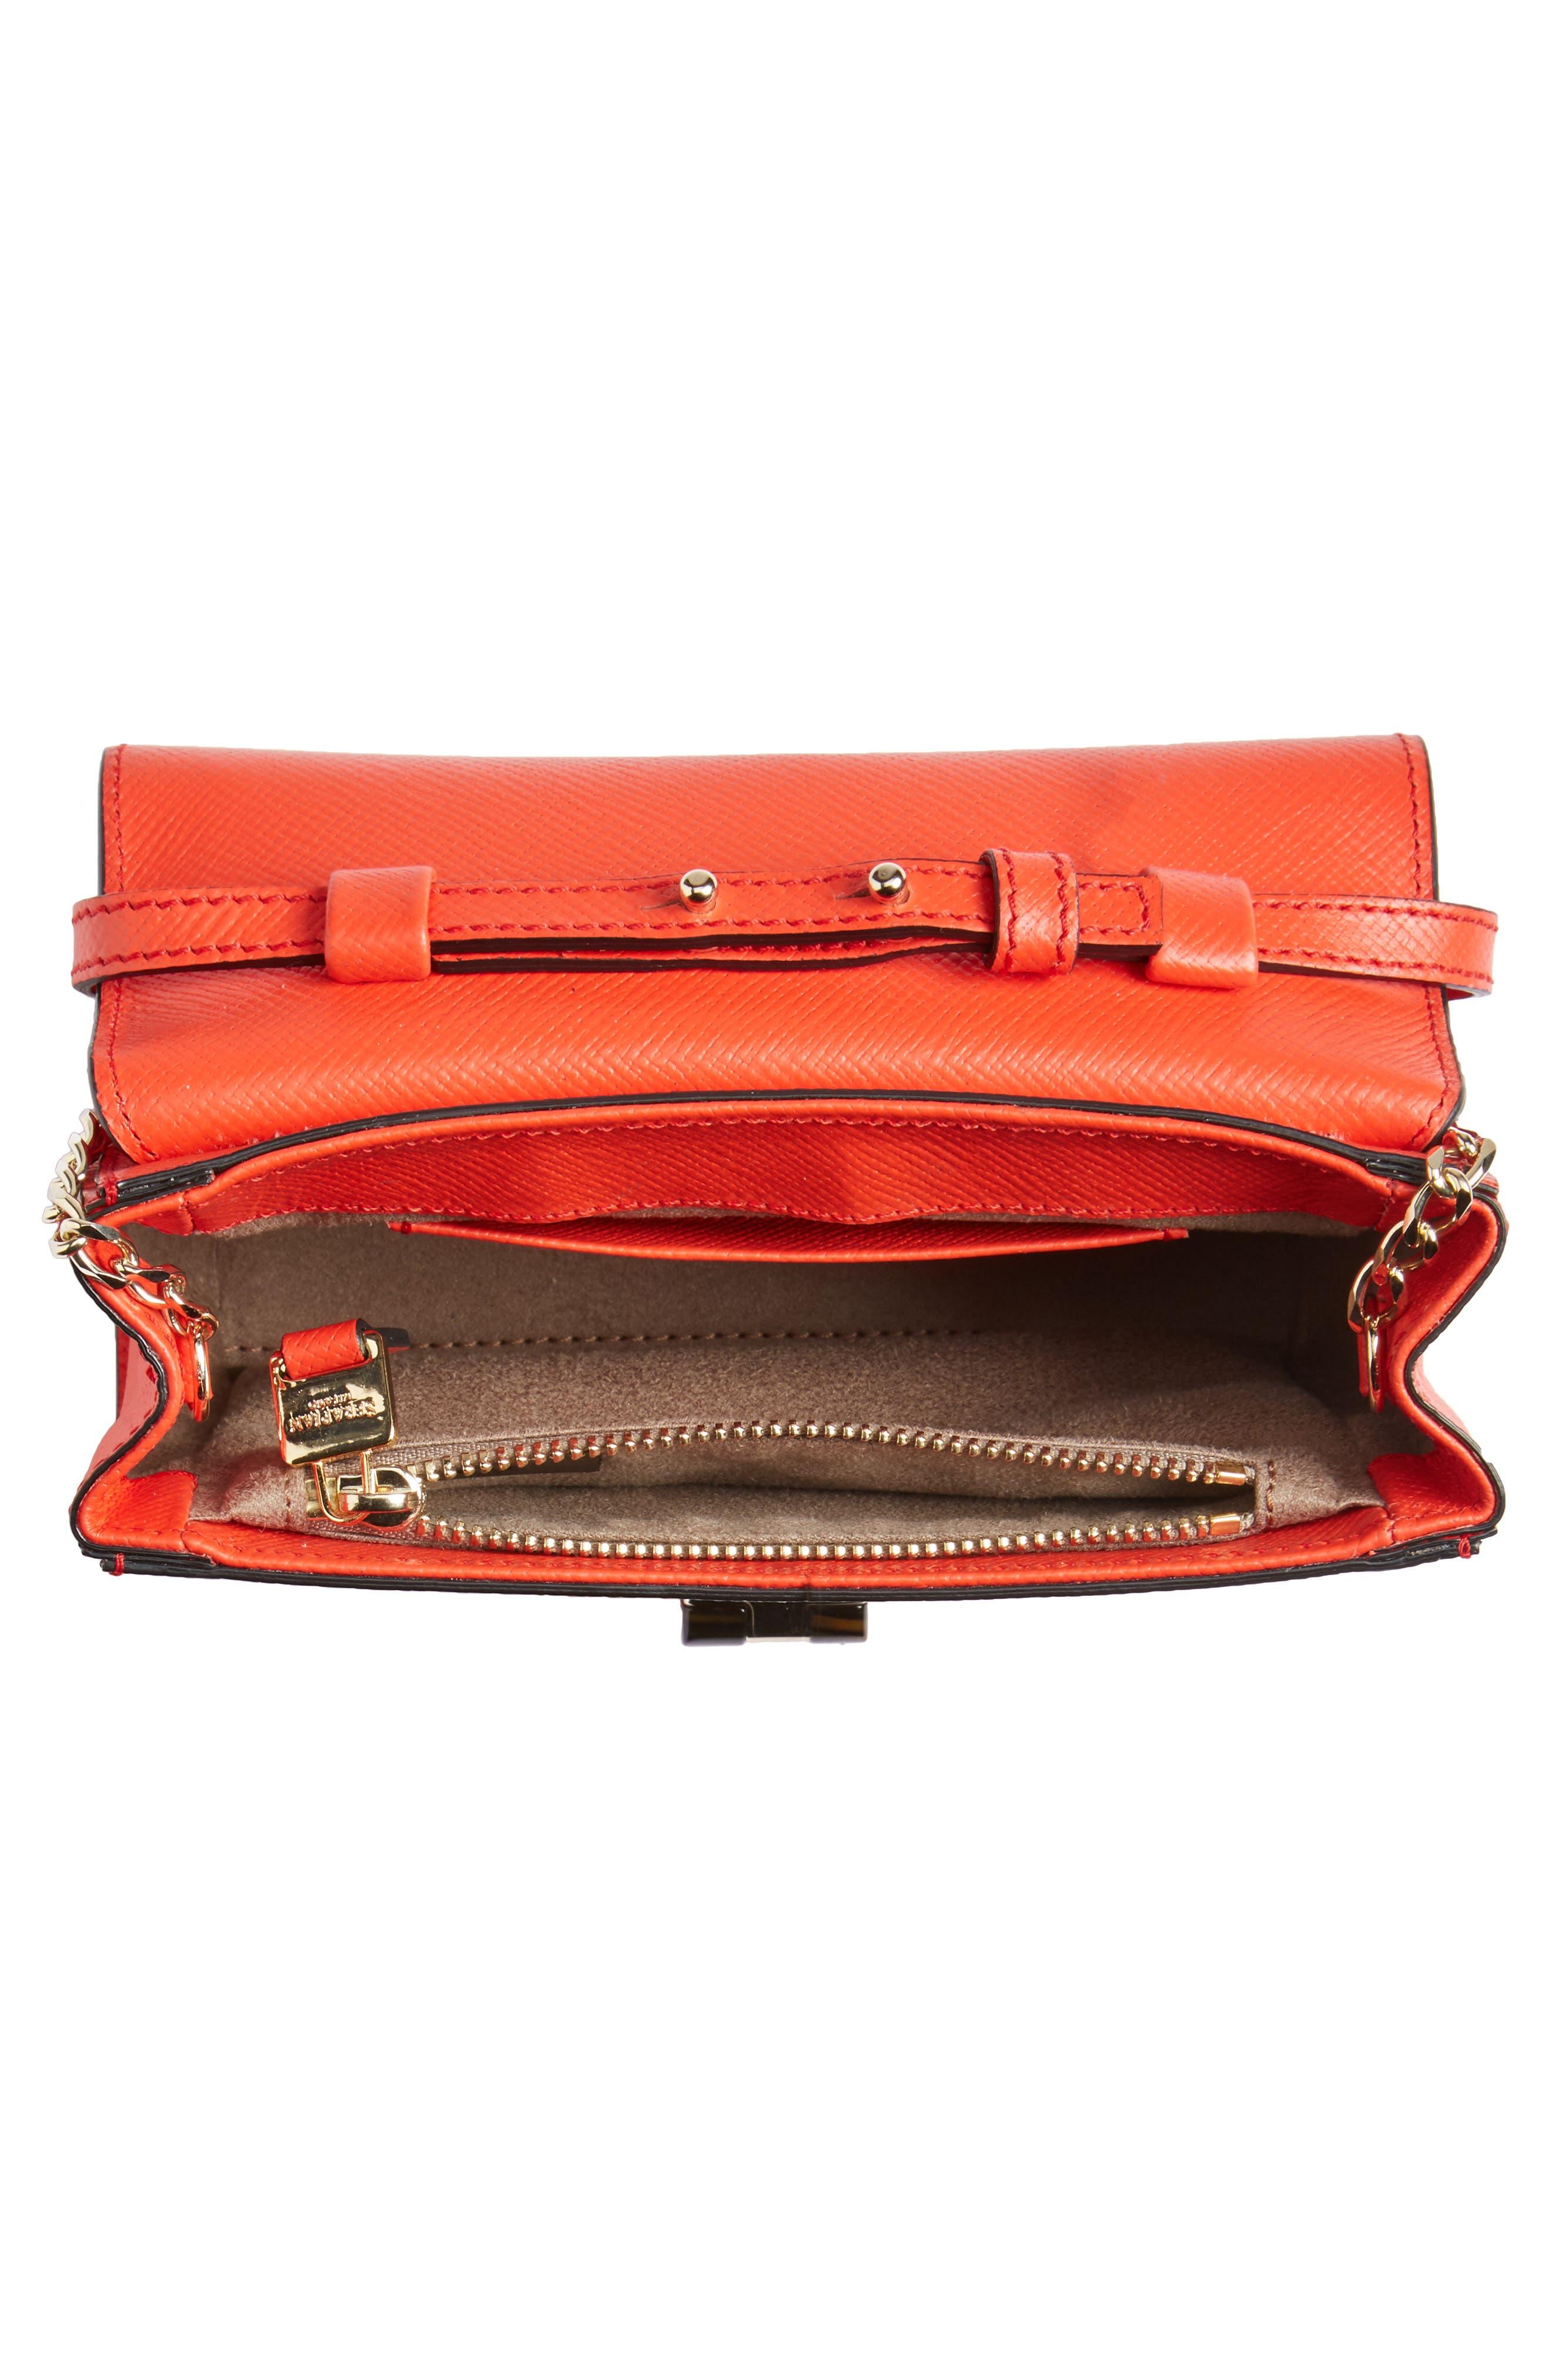 Mini Ilenea Leather Crossbody Bag,                             Alternate thumbnail 4, color,                             Coral Red